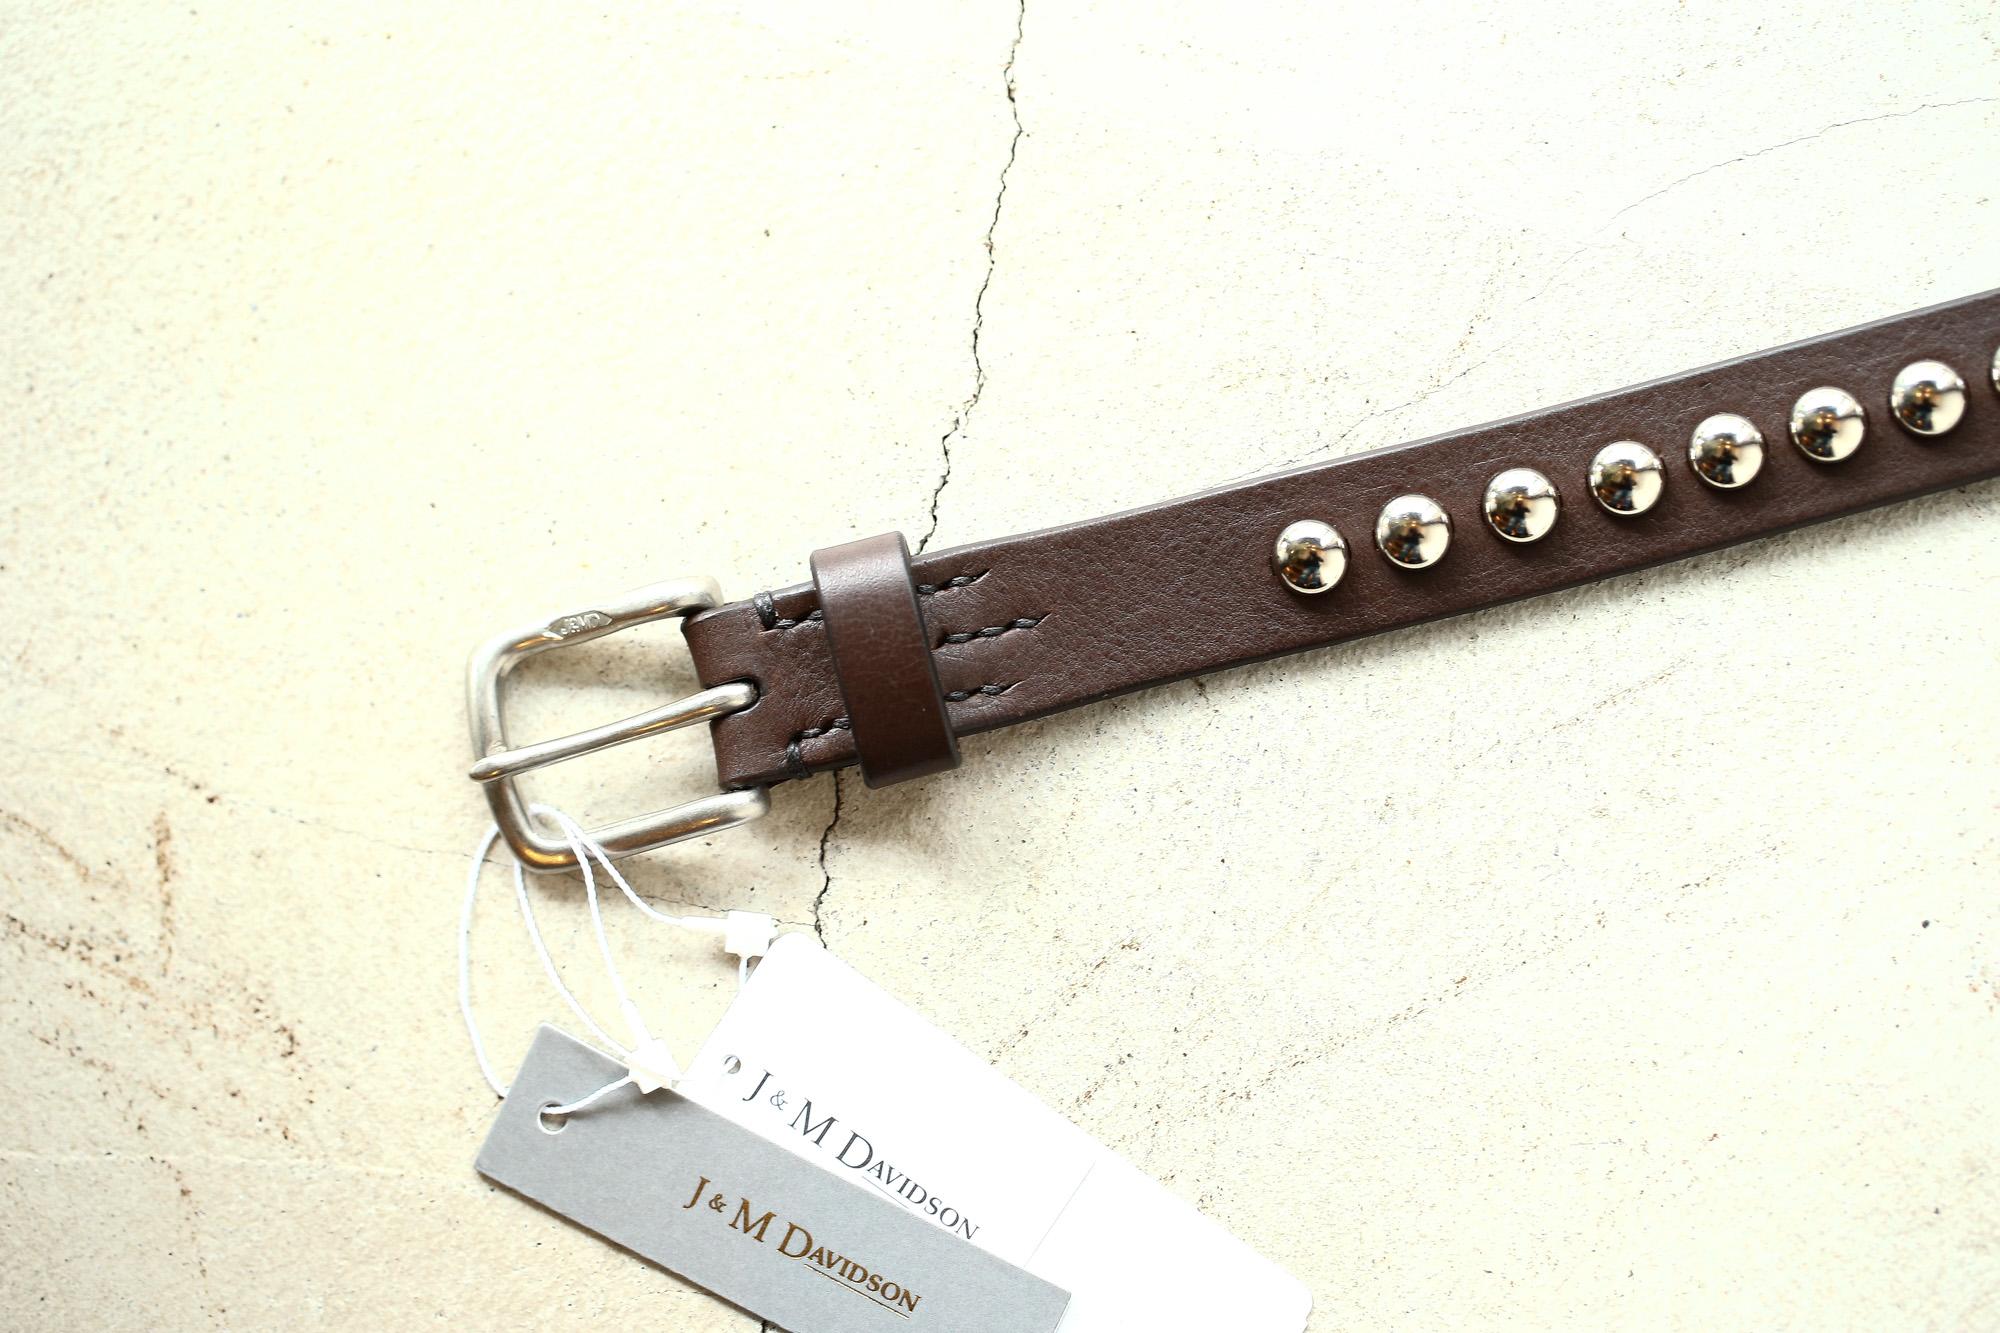 J&M DAVIDSON (ジェイアンドエムデヴィッドソン) DOME RIVETS NARROW BELT 25MM NICKEL-UNLINED (ドーム リベット ナローベルト 25mm) COWHIDE LEATHER (カウハイドレザー) スタッズベルト T.MORO (ブラウン・670) Made in italy (イタリア製) 2018 春夏新作 jandmdavidson jmdavidson 愛知 名古屋 ZODIAC ゾディアック ベルト ジェイエム